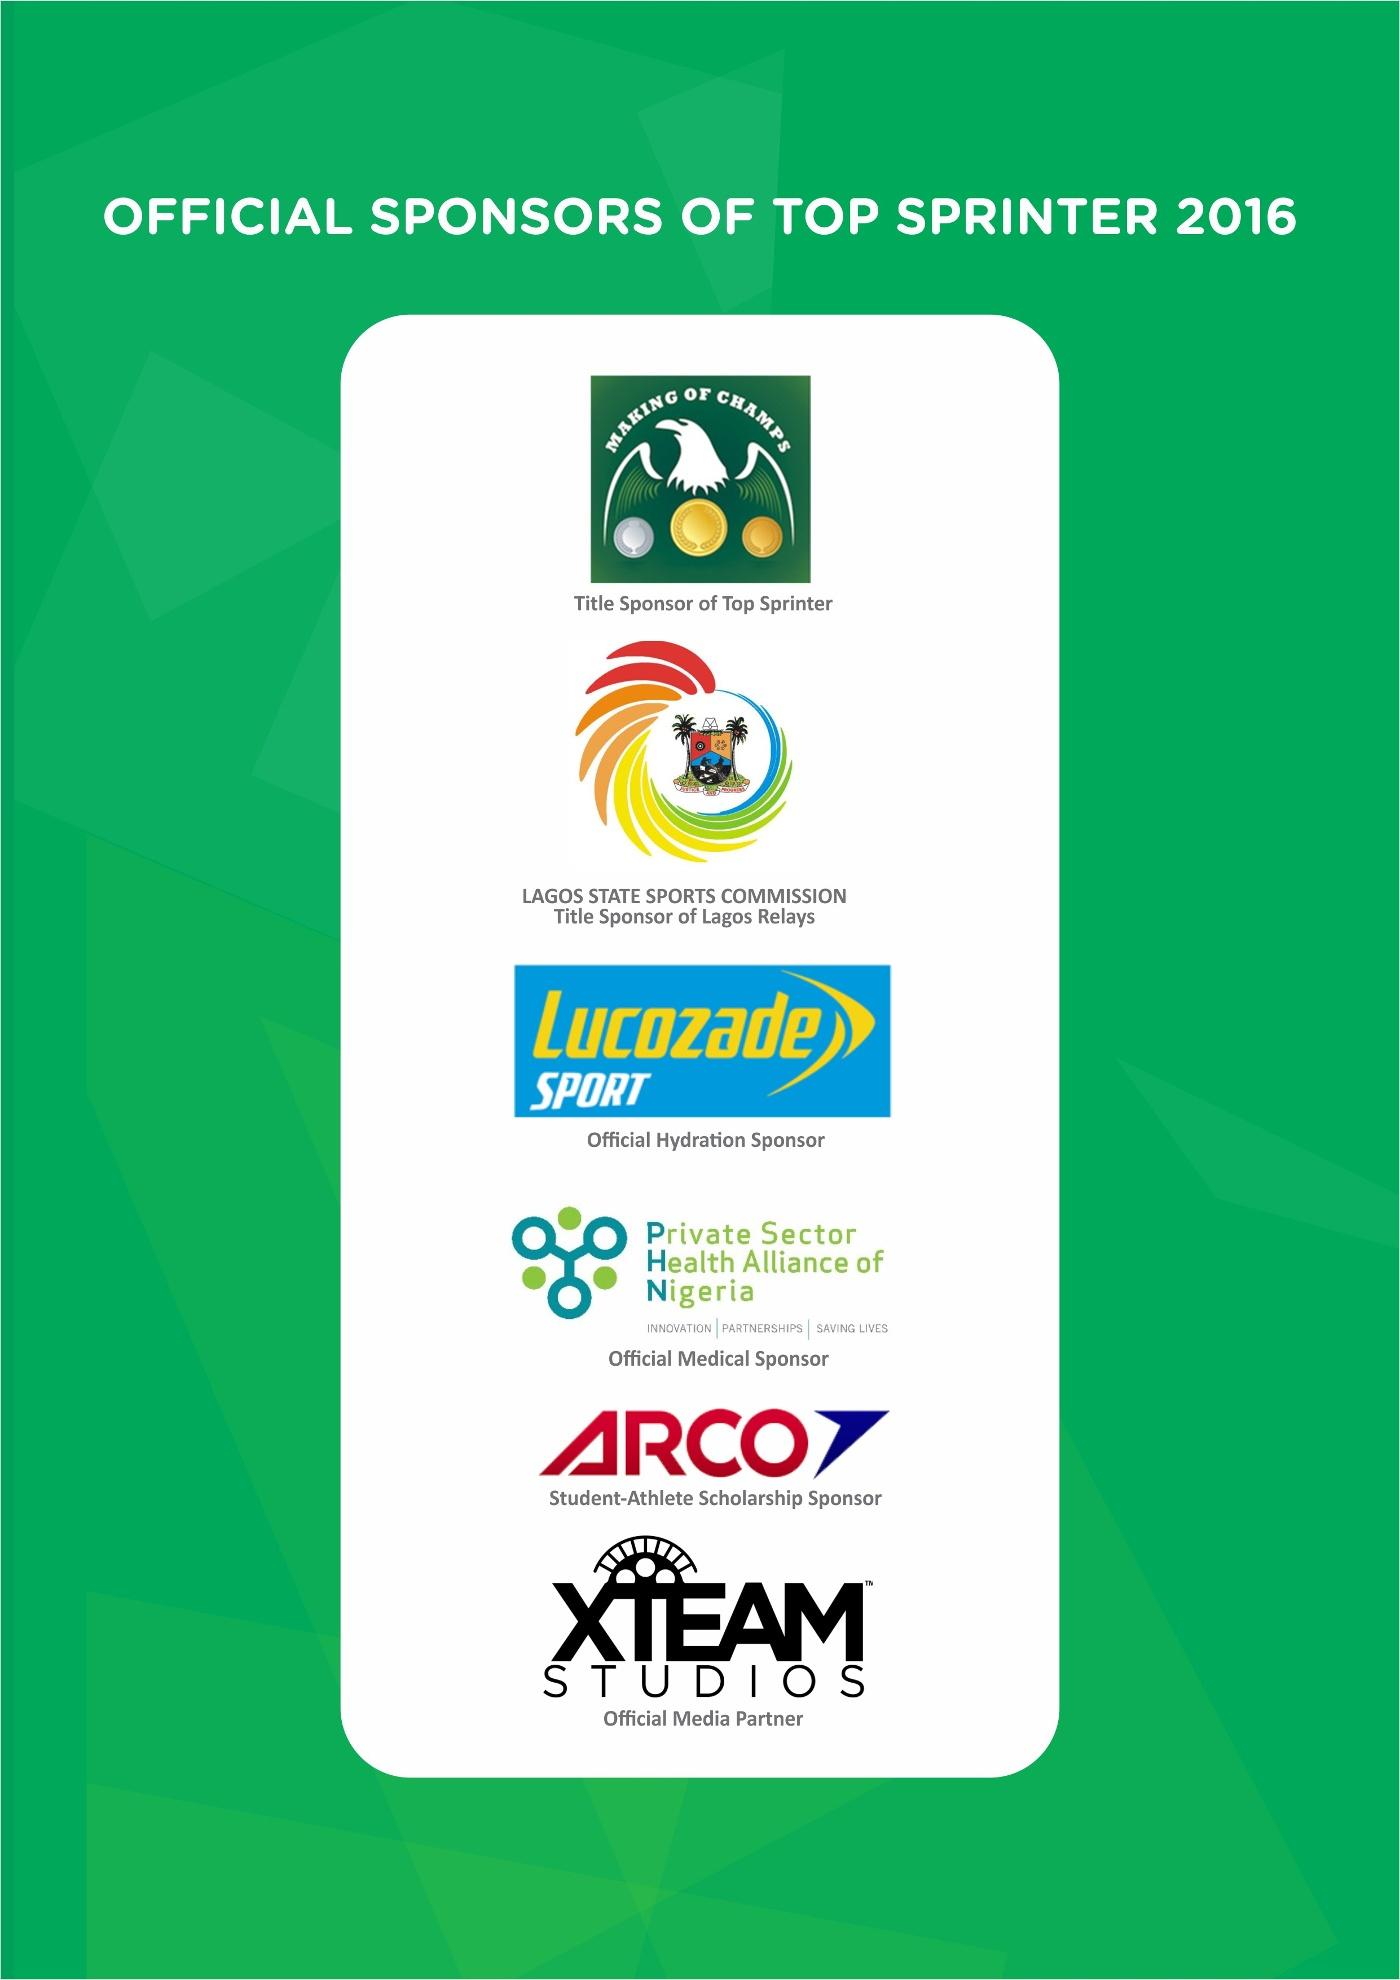 top-sprinter-2016-sponsors